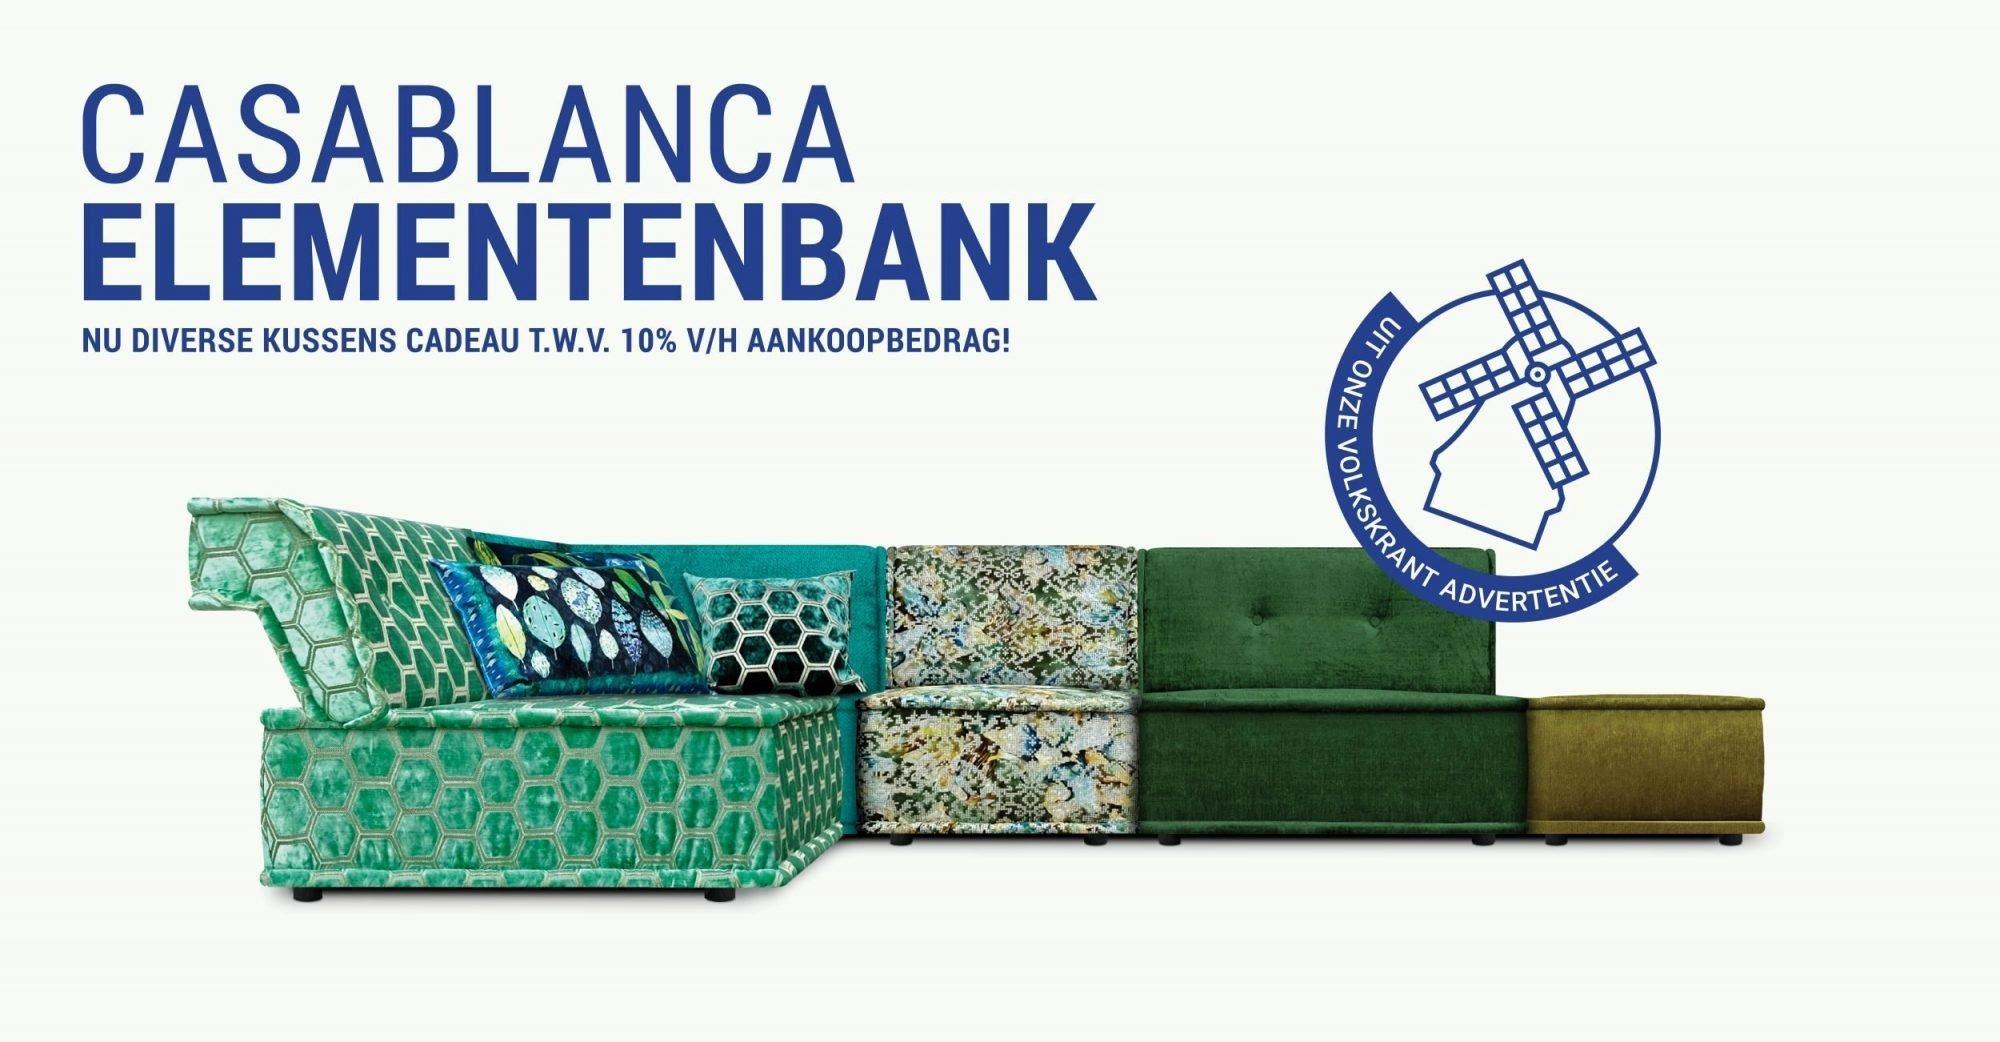 Casablance Elementen Bank Dutch Seating Company